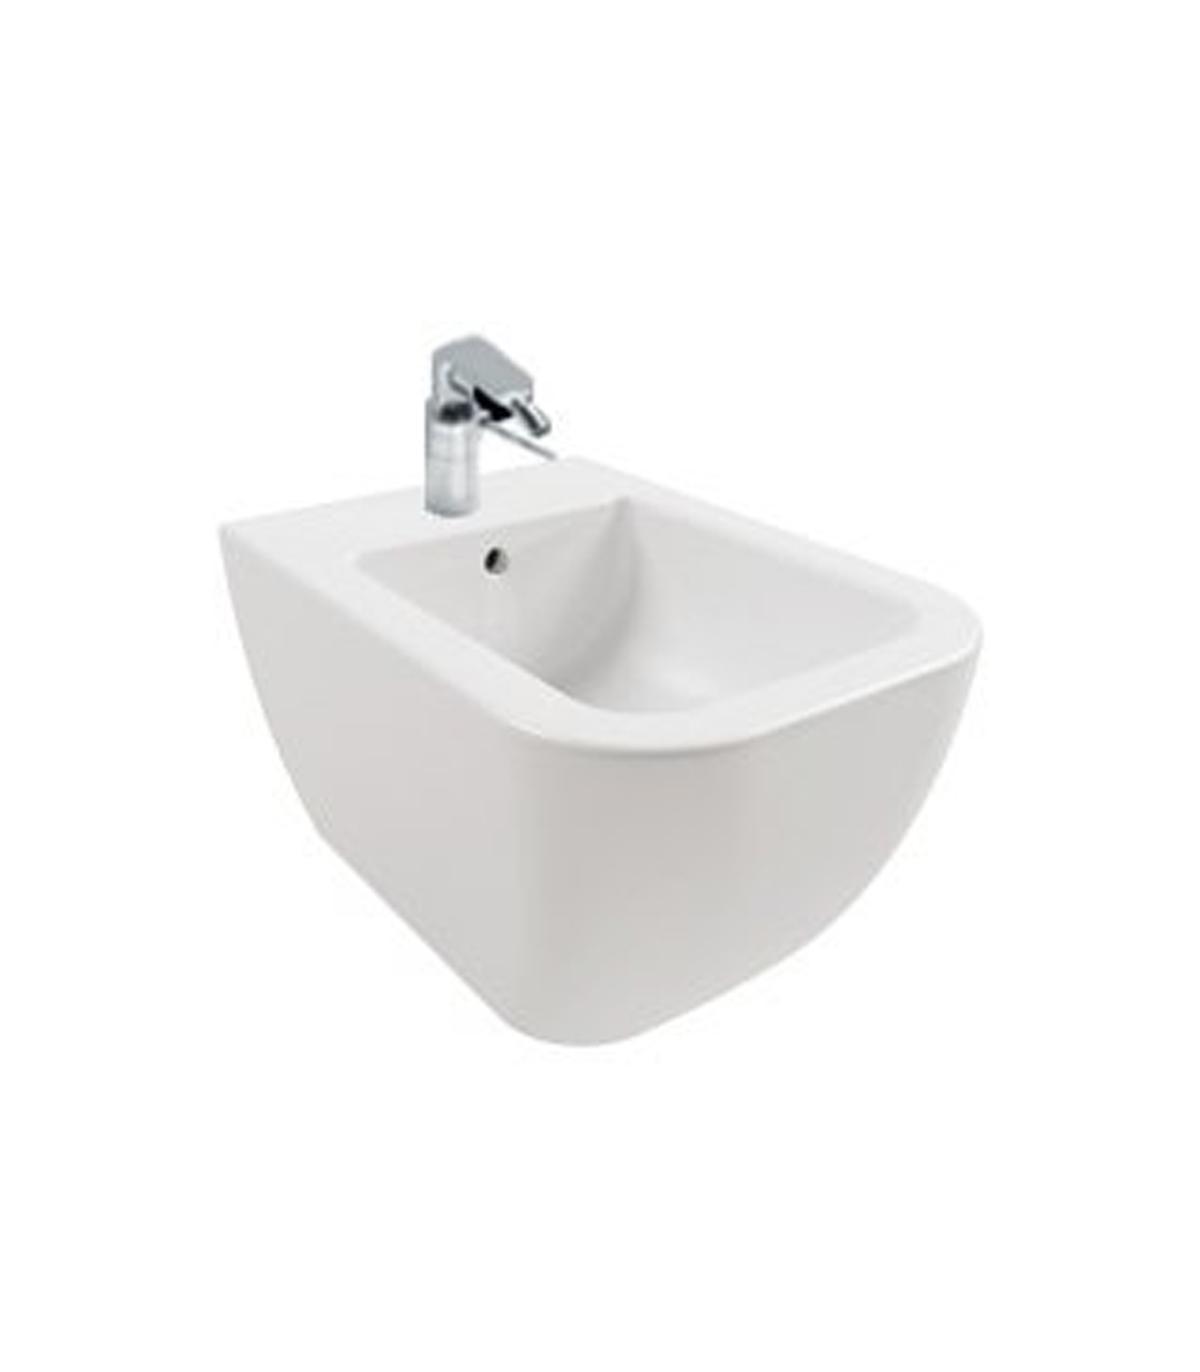 Vaso Ceramica Dolomite Miky.Column For Sink Completion Ceramica Dolomite Series Donatello Ar